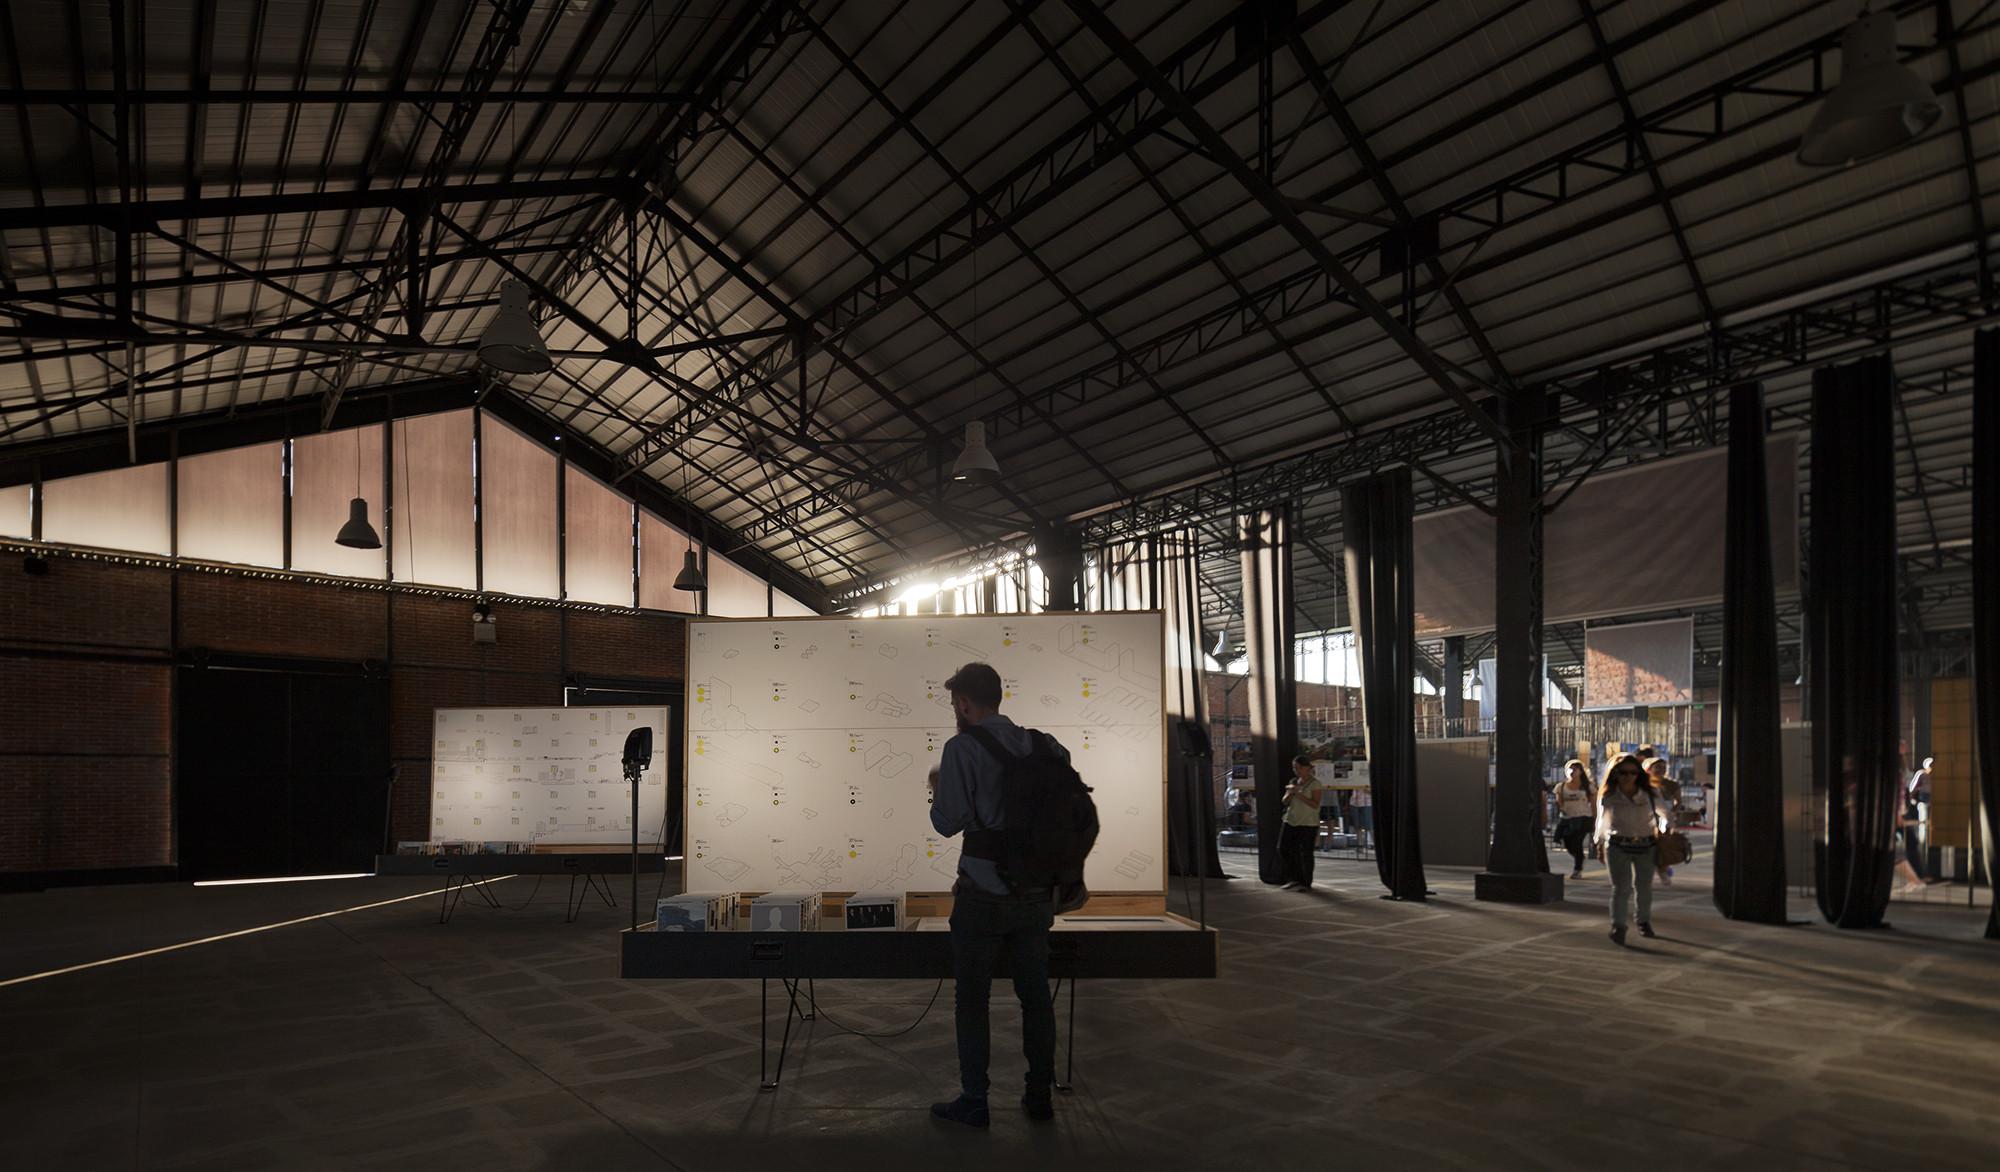 IX BIAU: Una arquitectura joven pero madura, Pabellones de IX BIAU. Image © Federico Cairoli